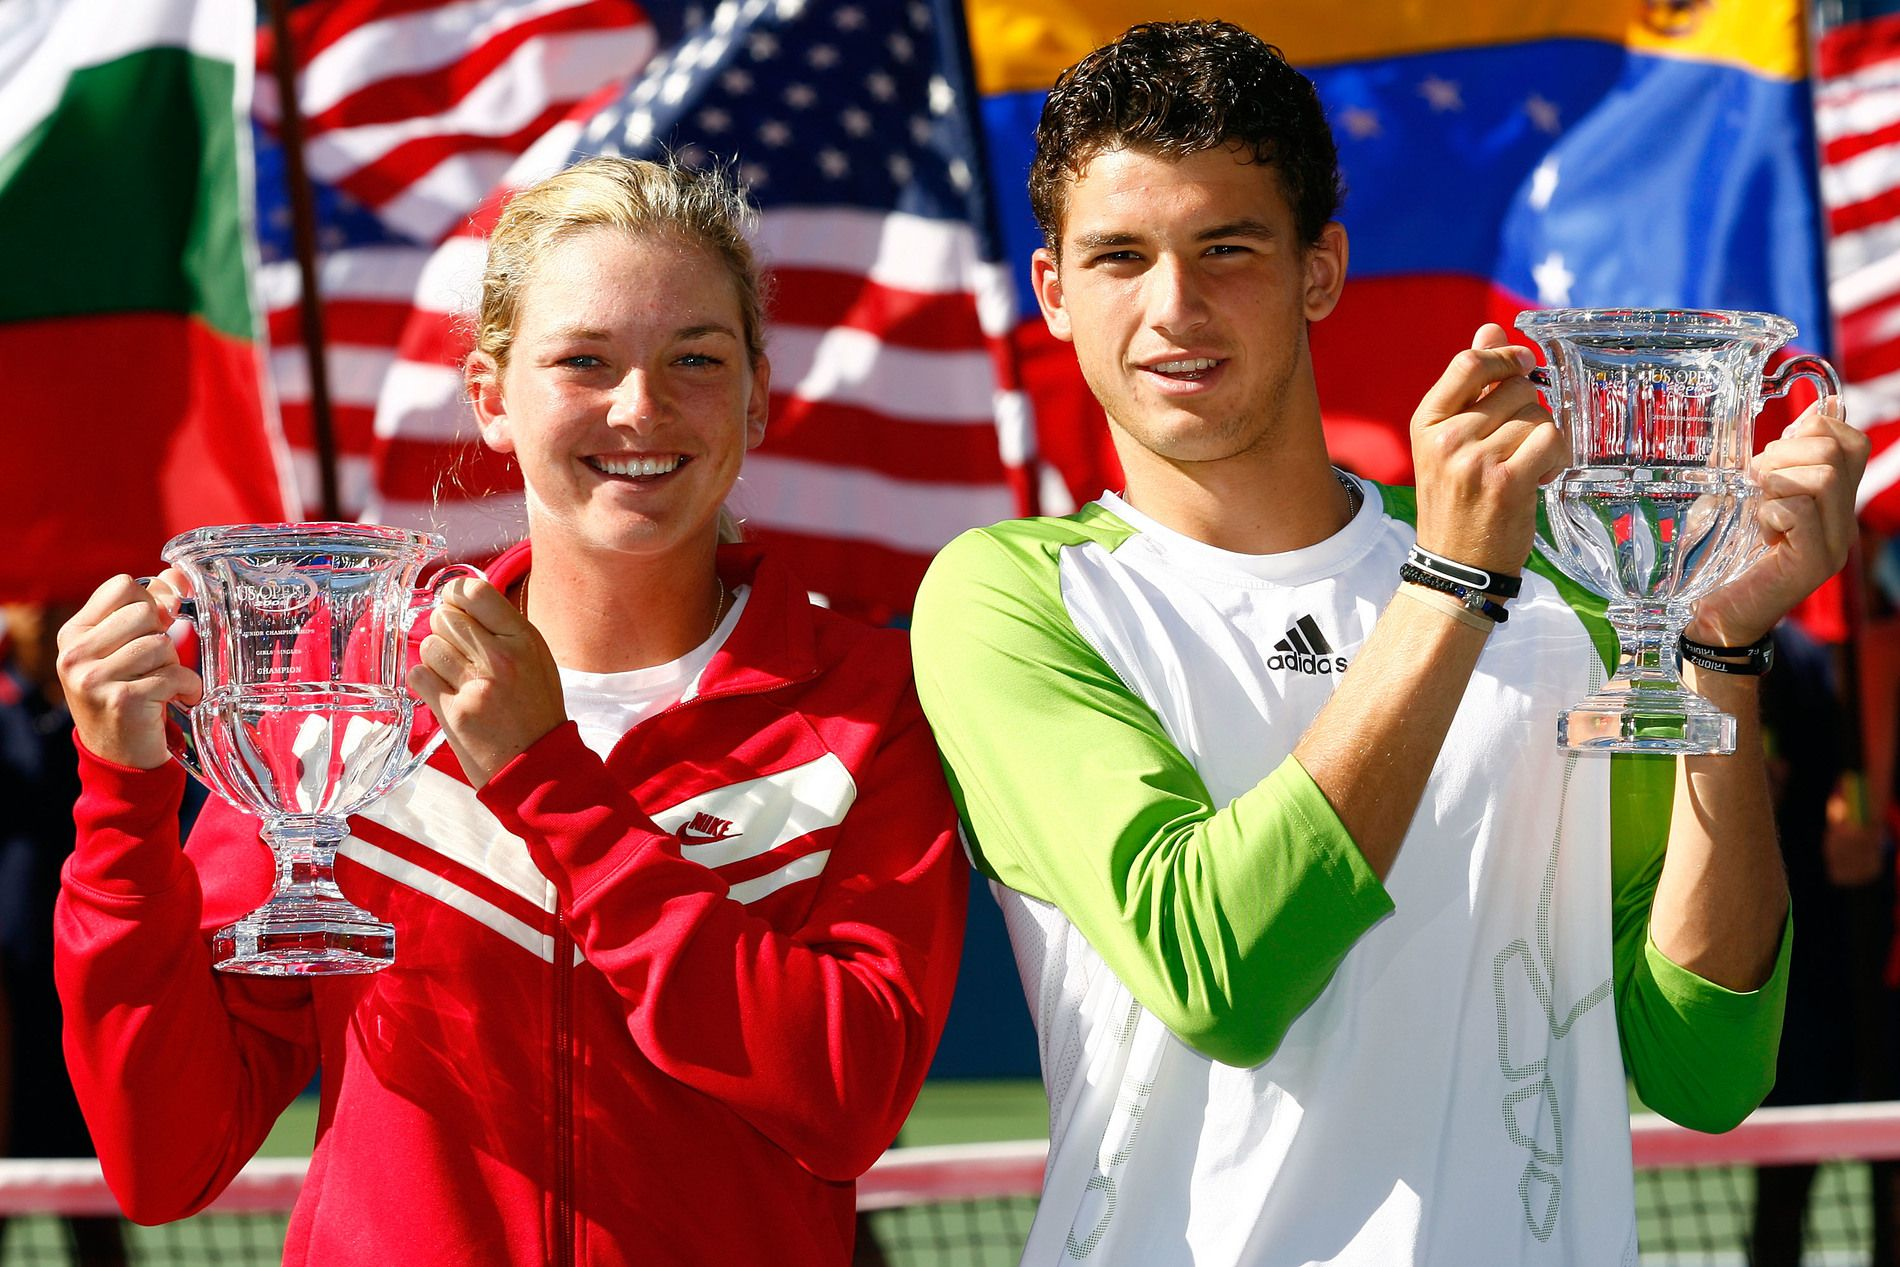 Шампионите на US Open - Григор Димитров и Коко Вандевеге